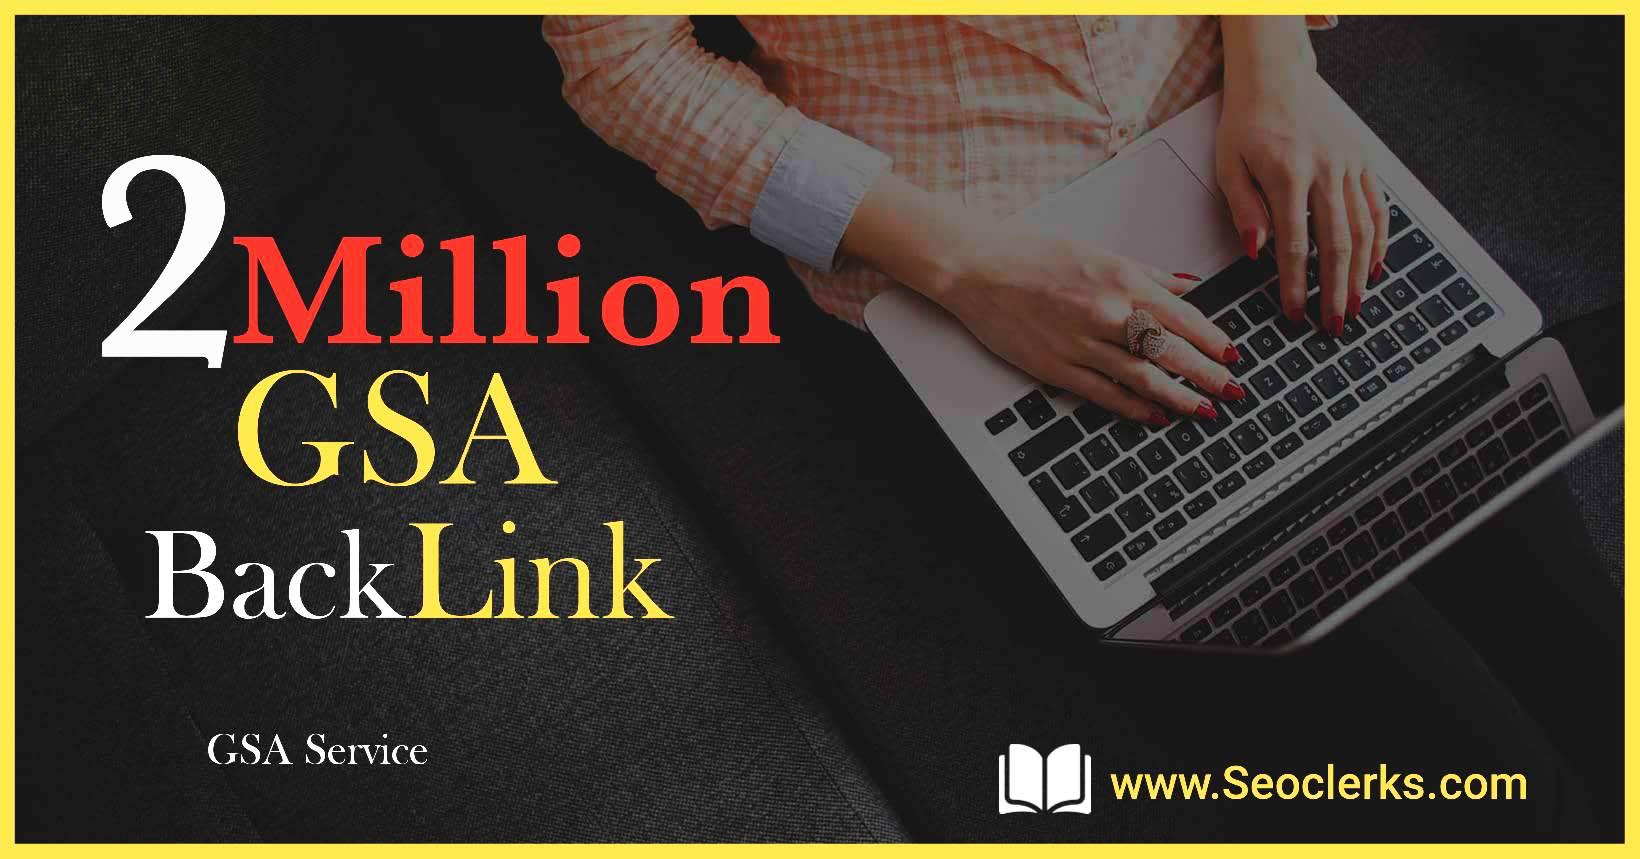 2 Million SEO GSA SER High Quality Backlinks for Google Ranking